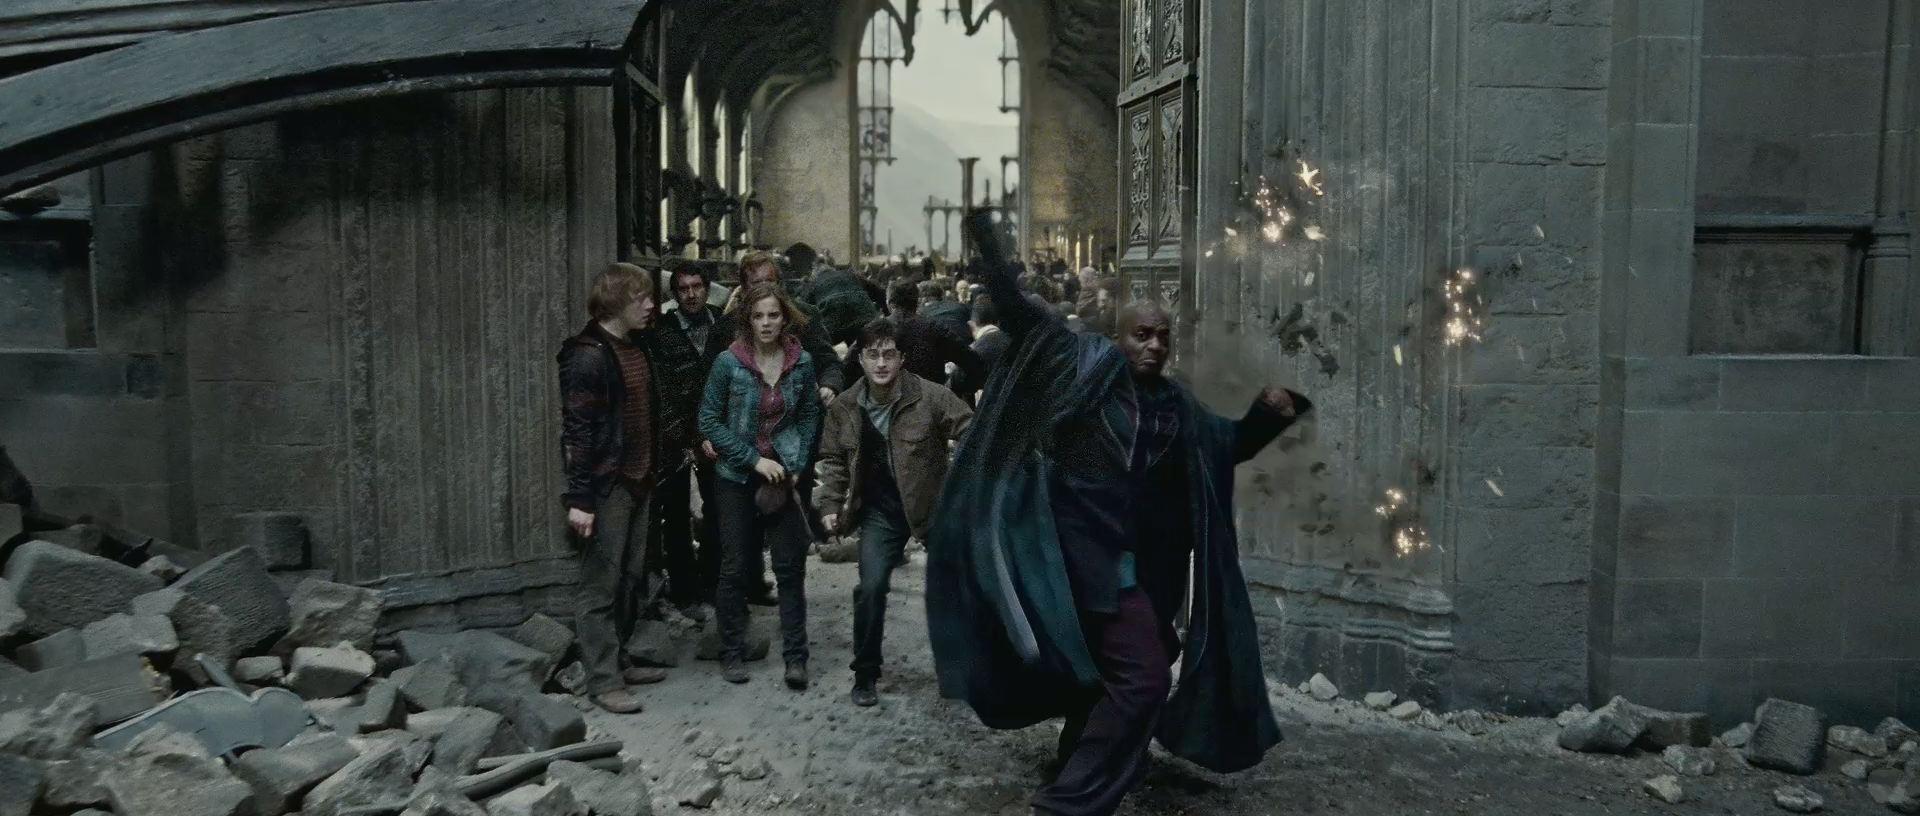 Harry Potter BlogHogwarts HP7 2 Trailer 39